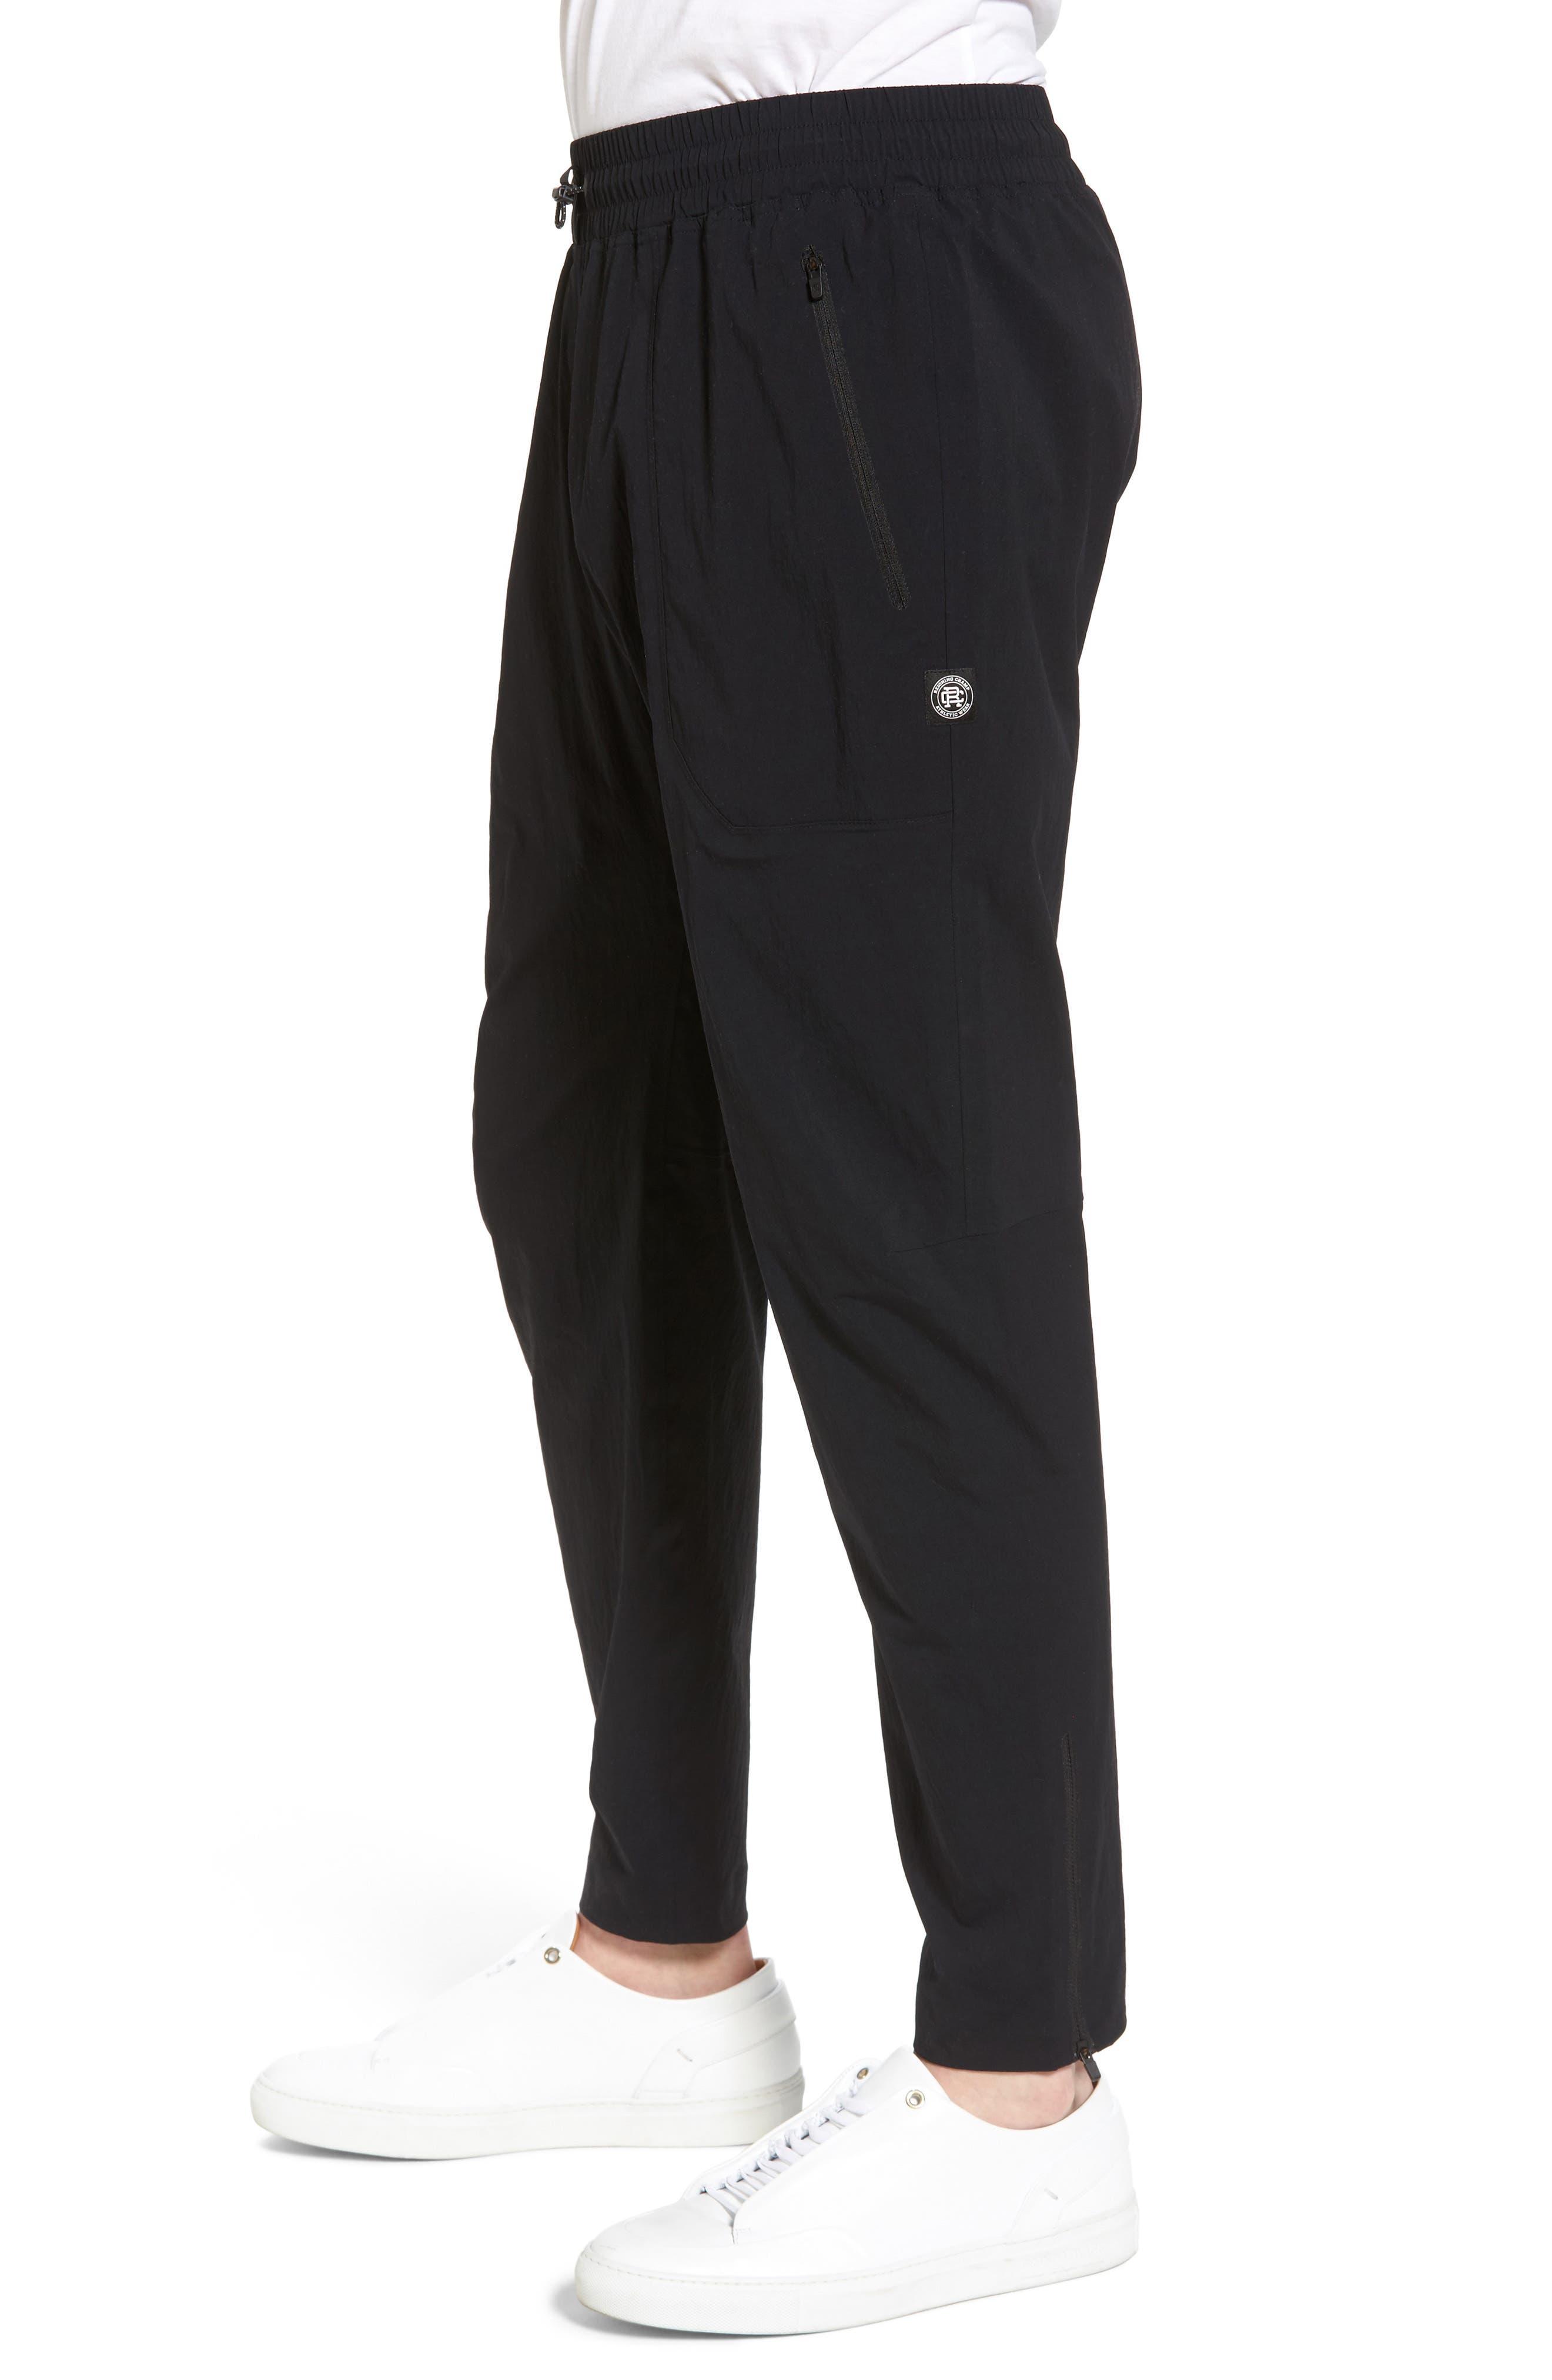 N279 Sweatpants,                             Alternate thumbnail 3, color,                             Black